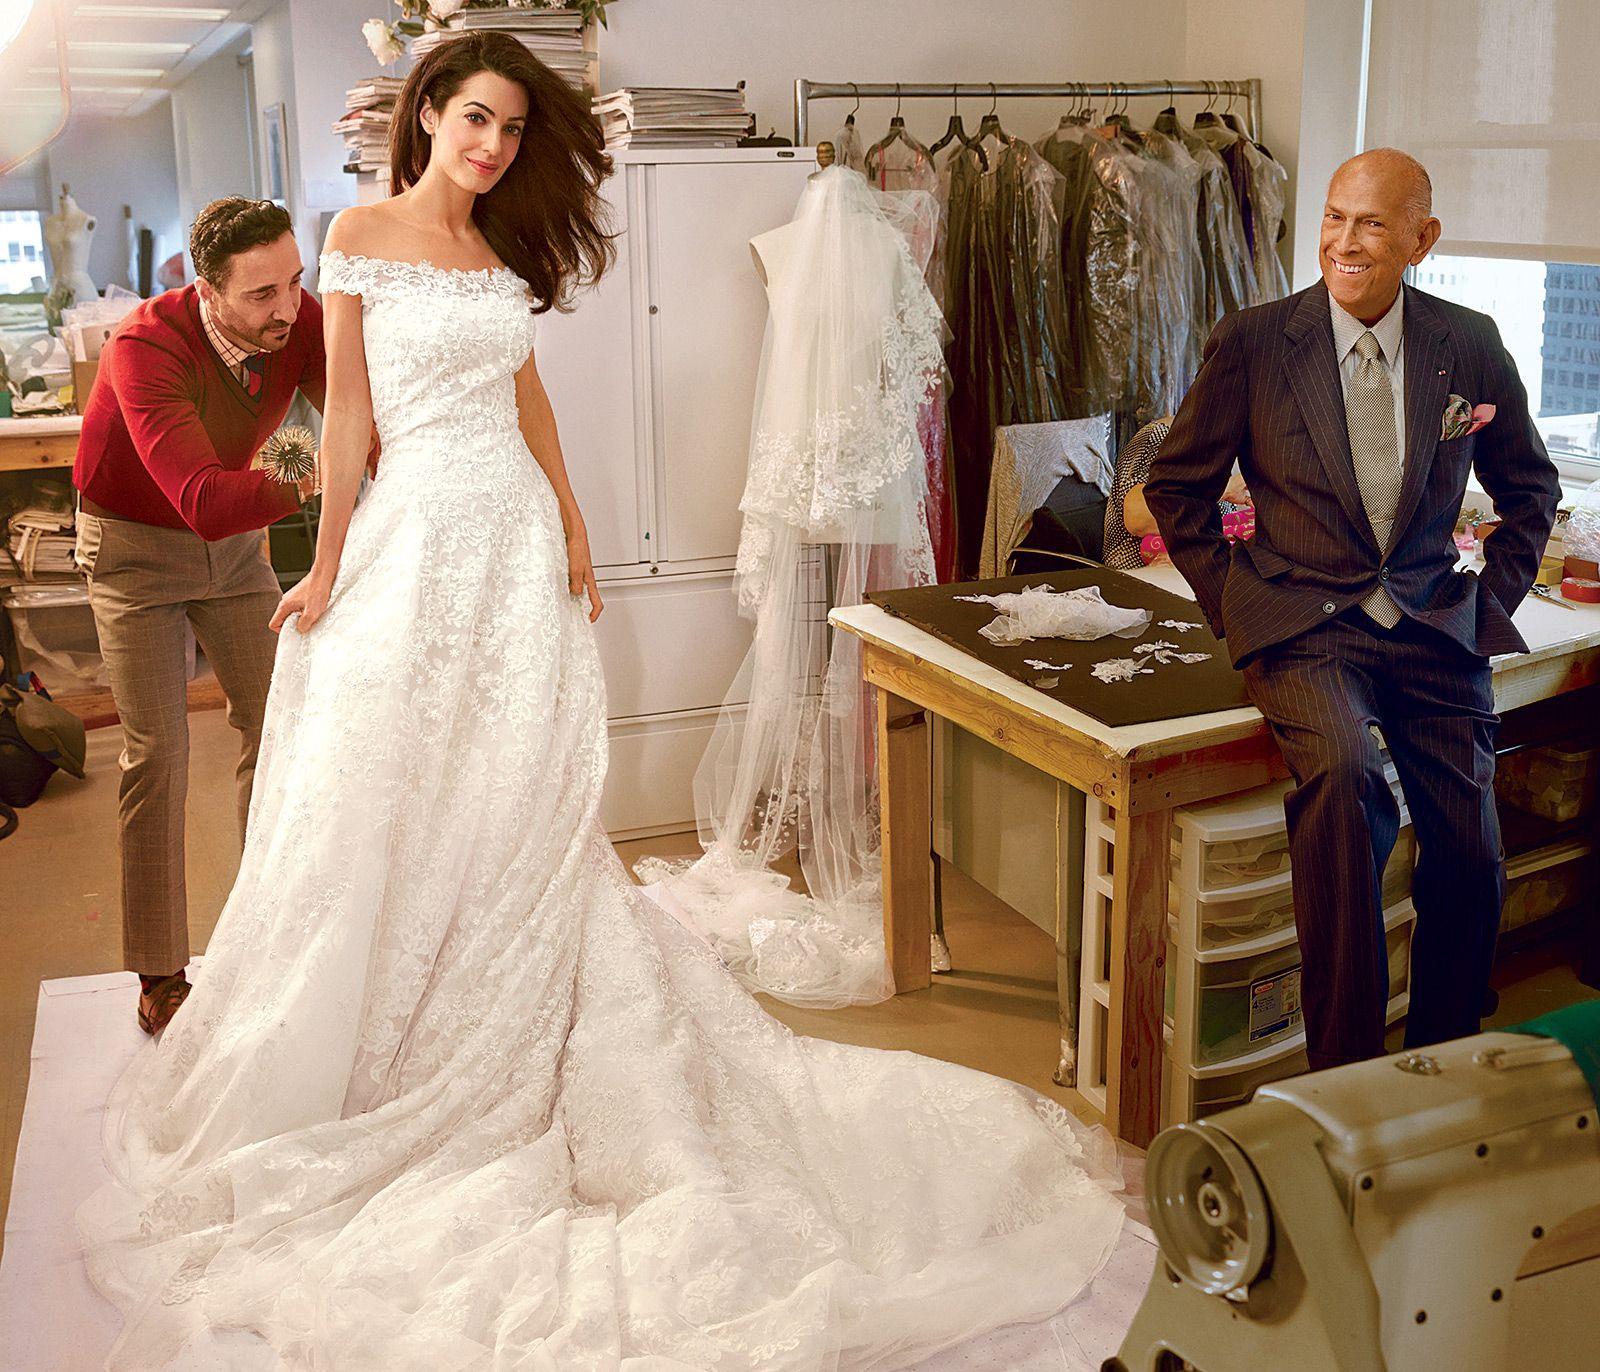 7526b5830fa5 Amal Clooney's Wedding Dress | Amal Alamuddin's Last Wedding Dress Fitting  Pictures; George Clooney's .